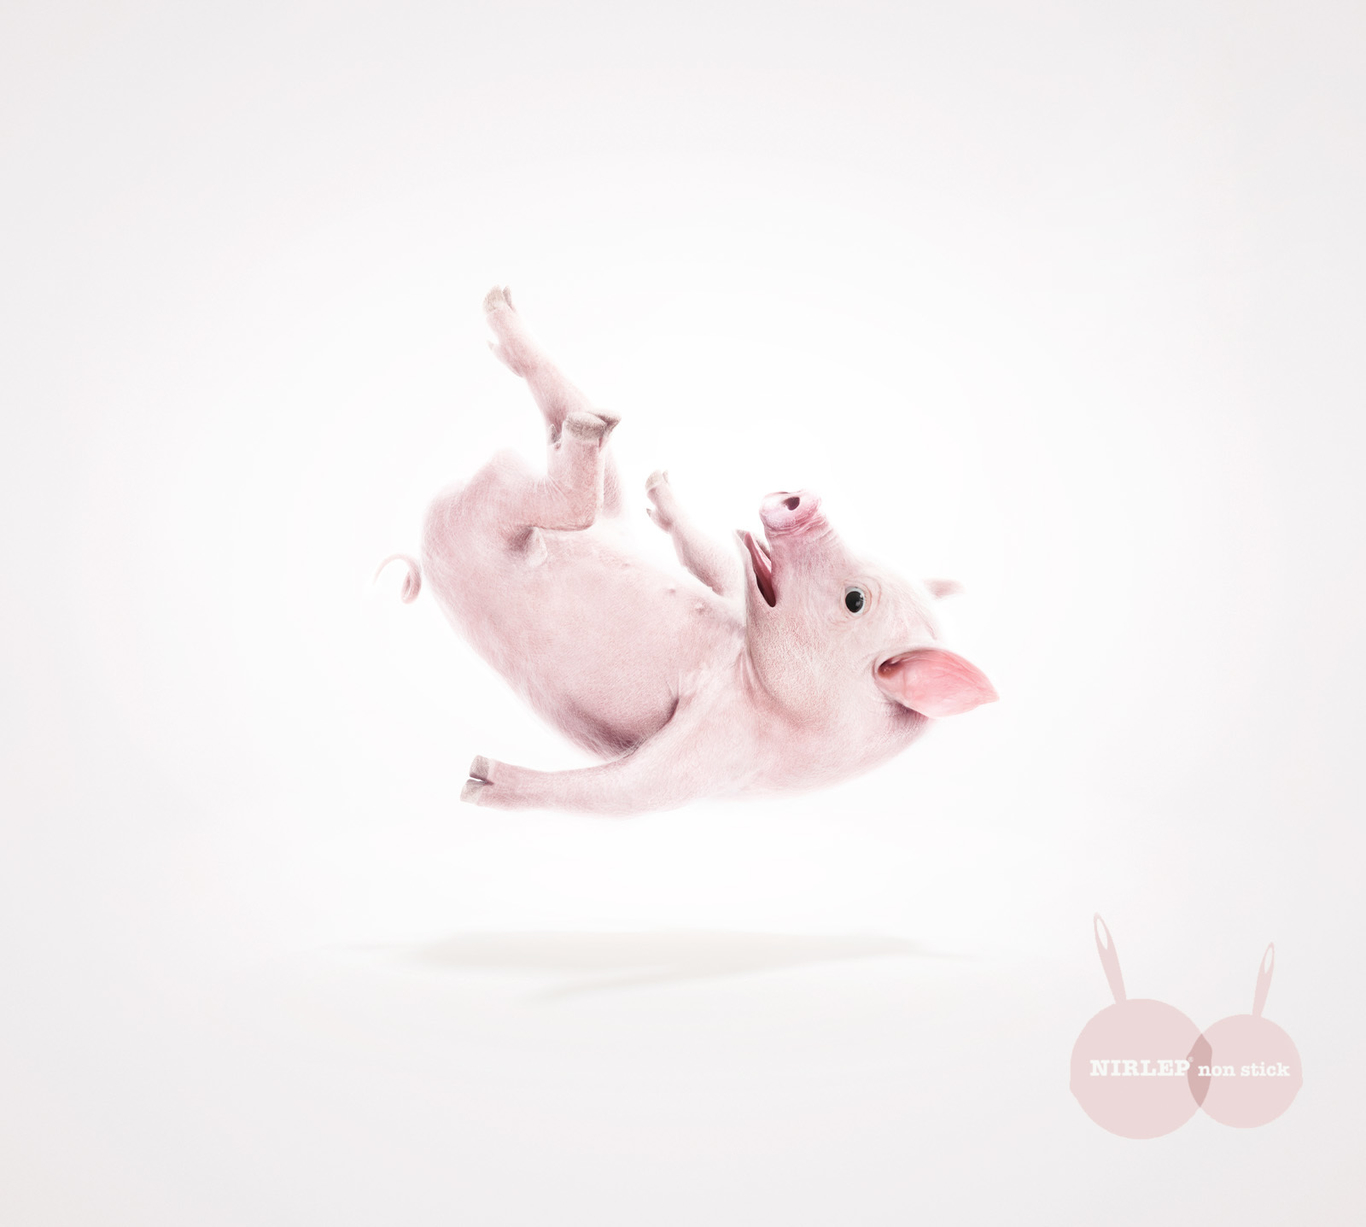 Marcelojr pig nirlep non stick 1 98298095 0z2o